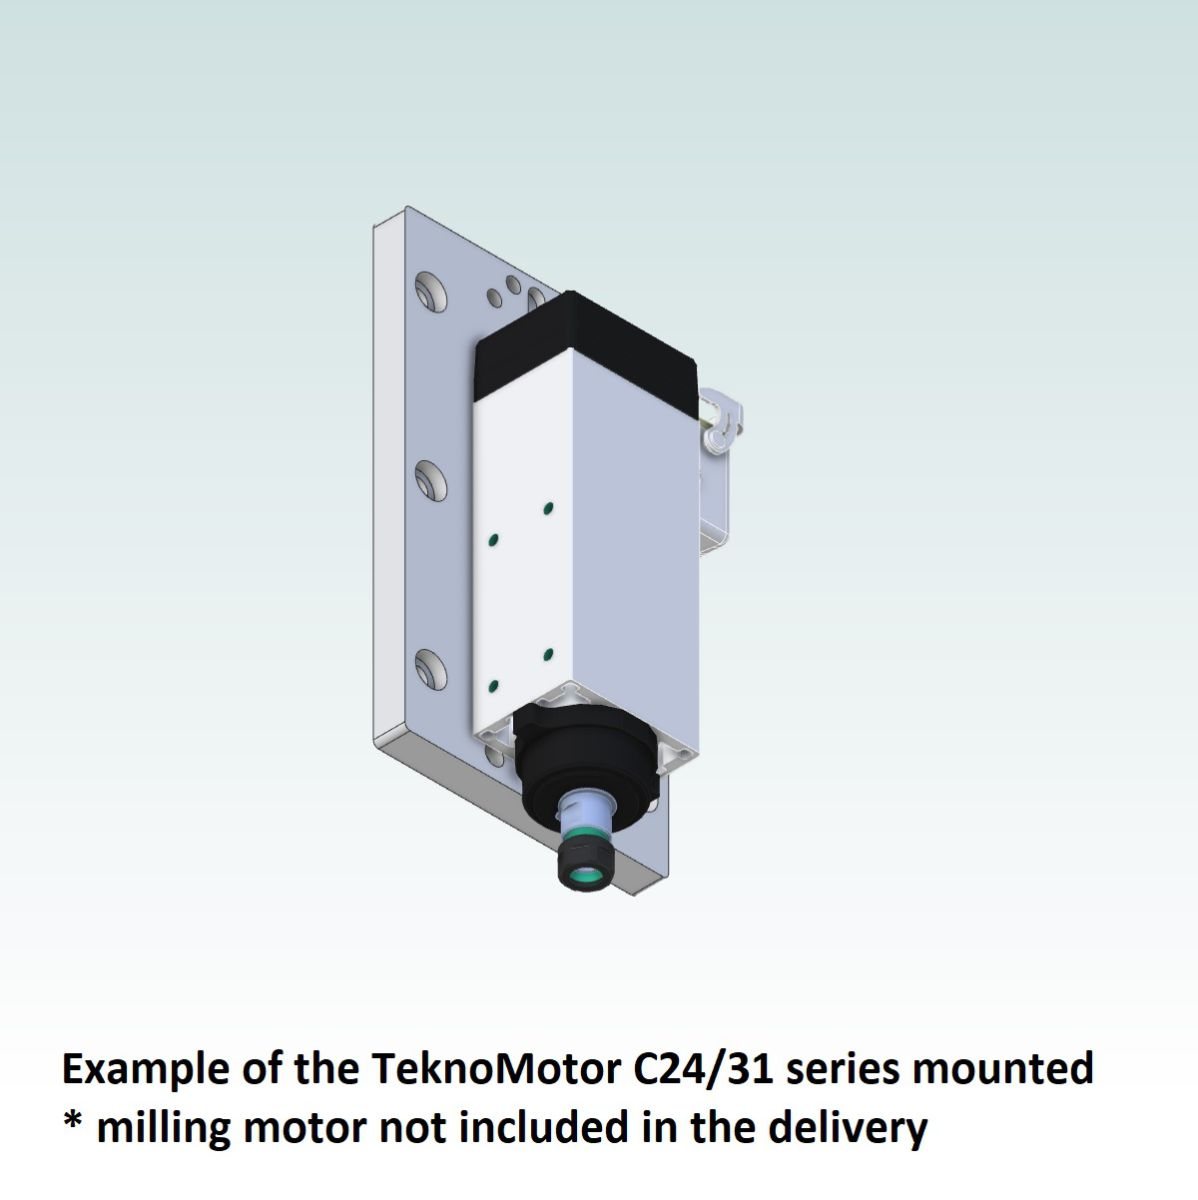 42716 teknomotor mountingplate icp4030 example with teknomotor c2431 mounted